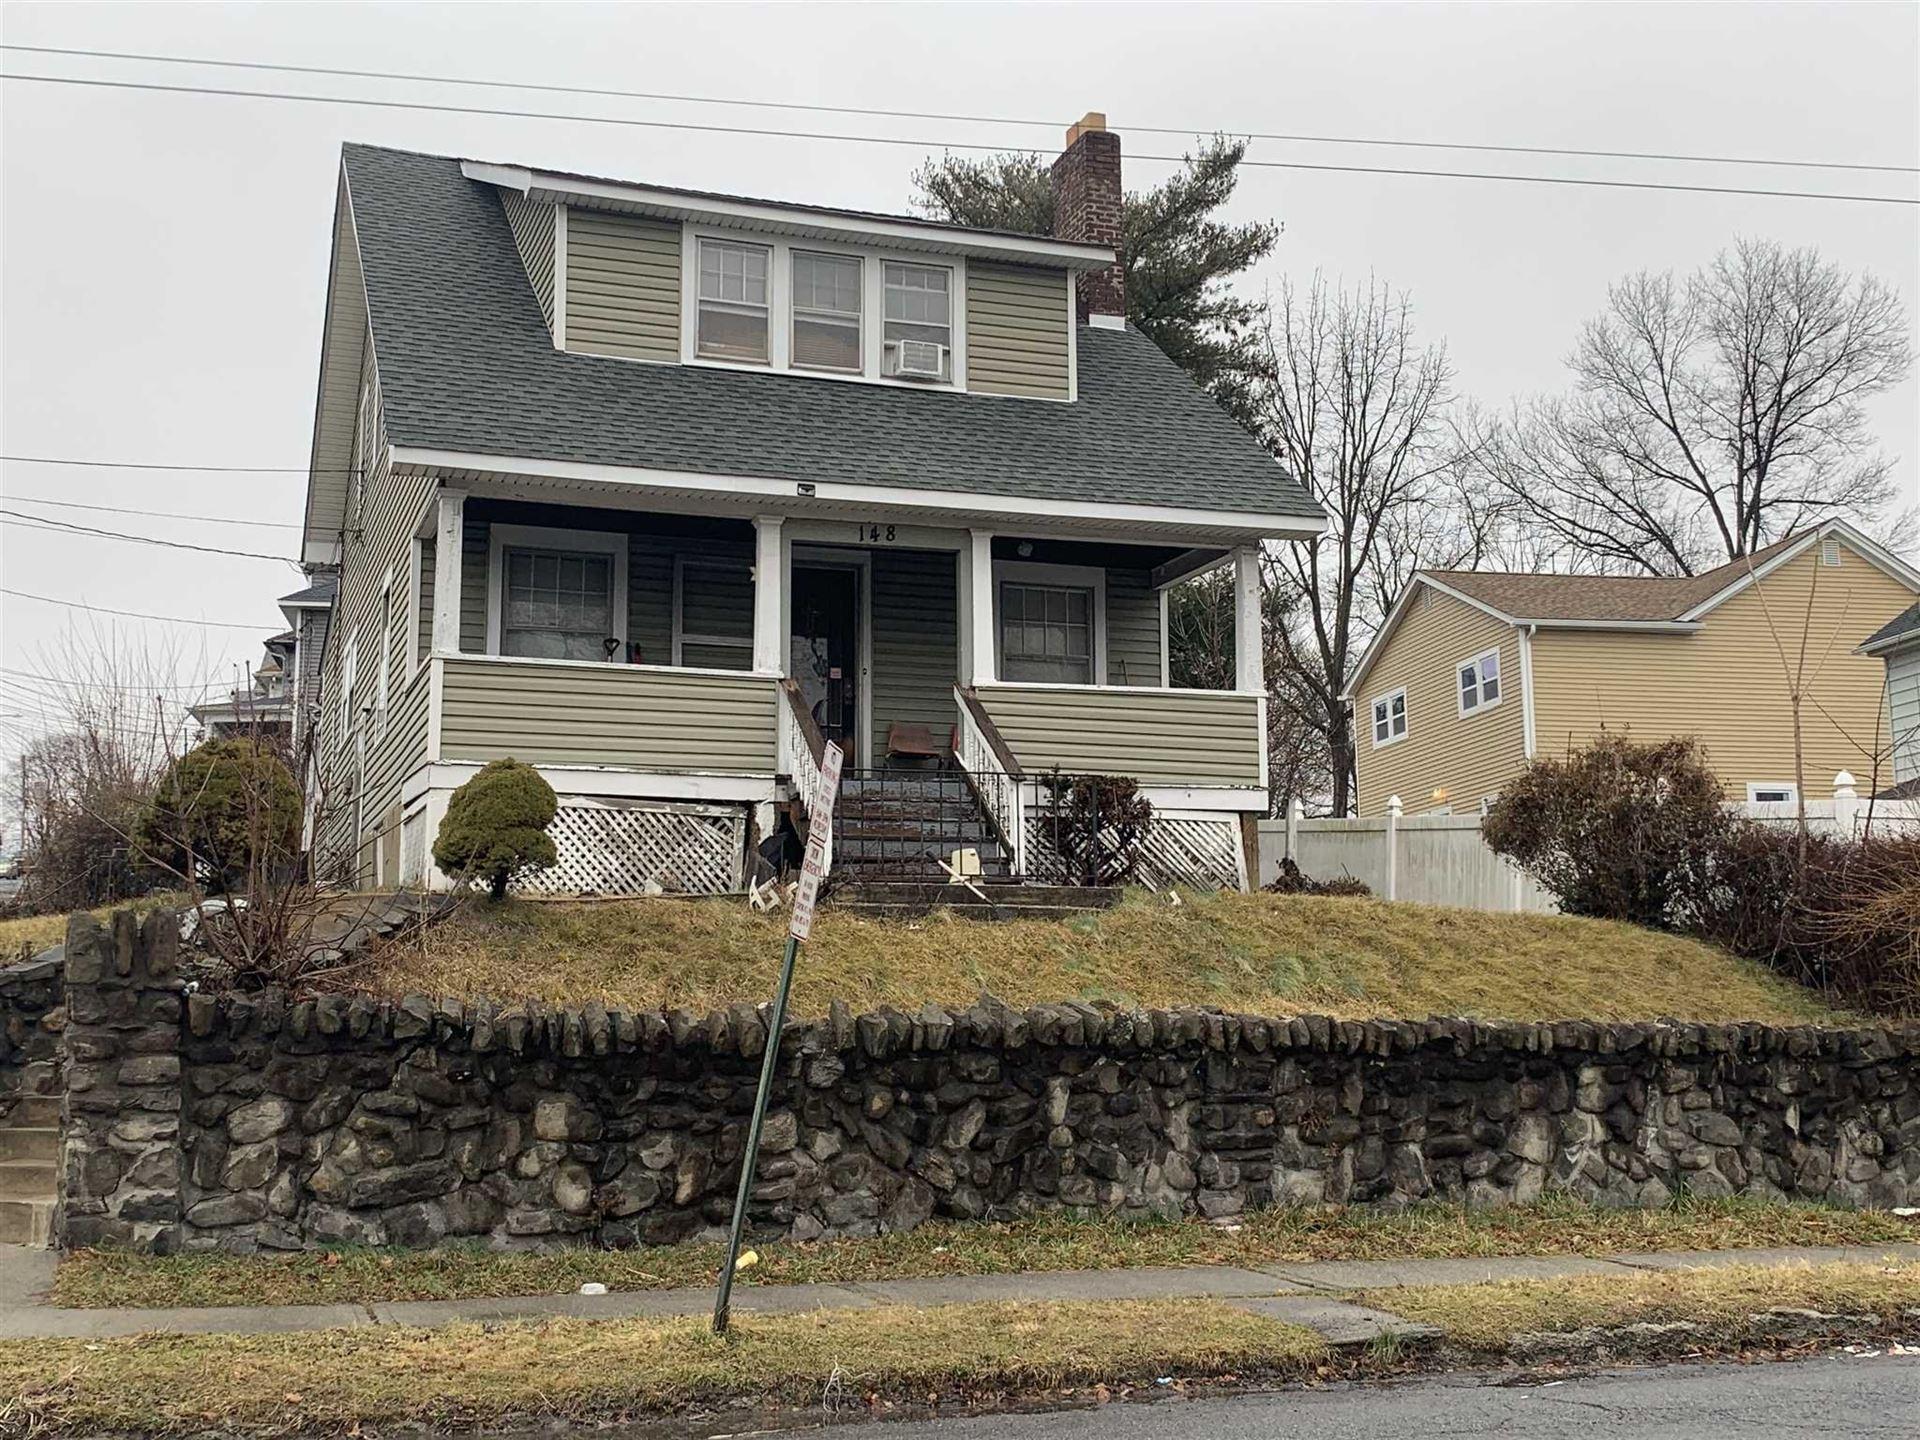 148 GIDNEY AVE, Newburgh, NY 12550 - #: 388973